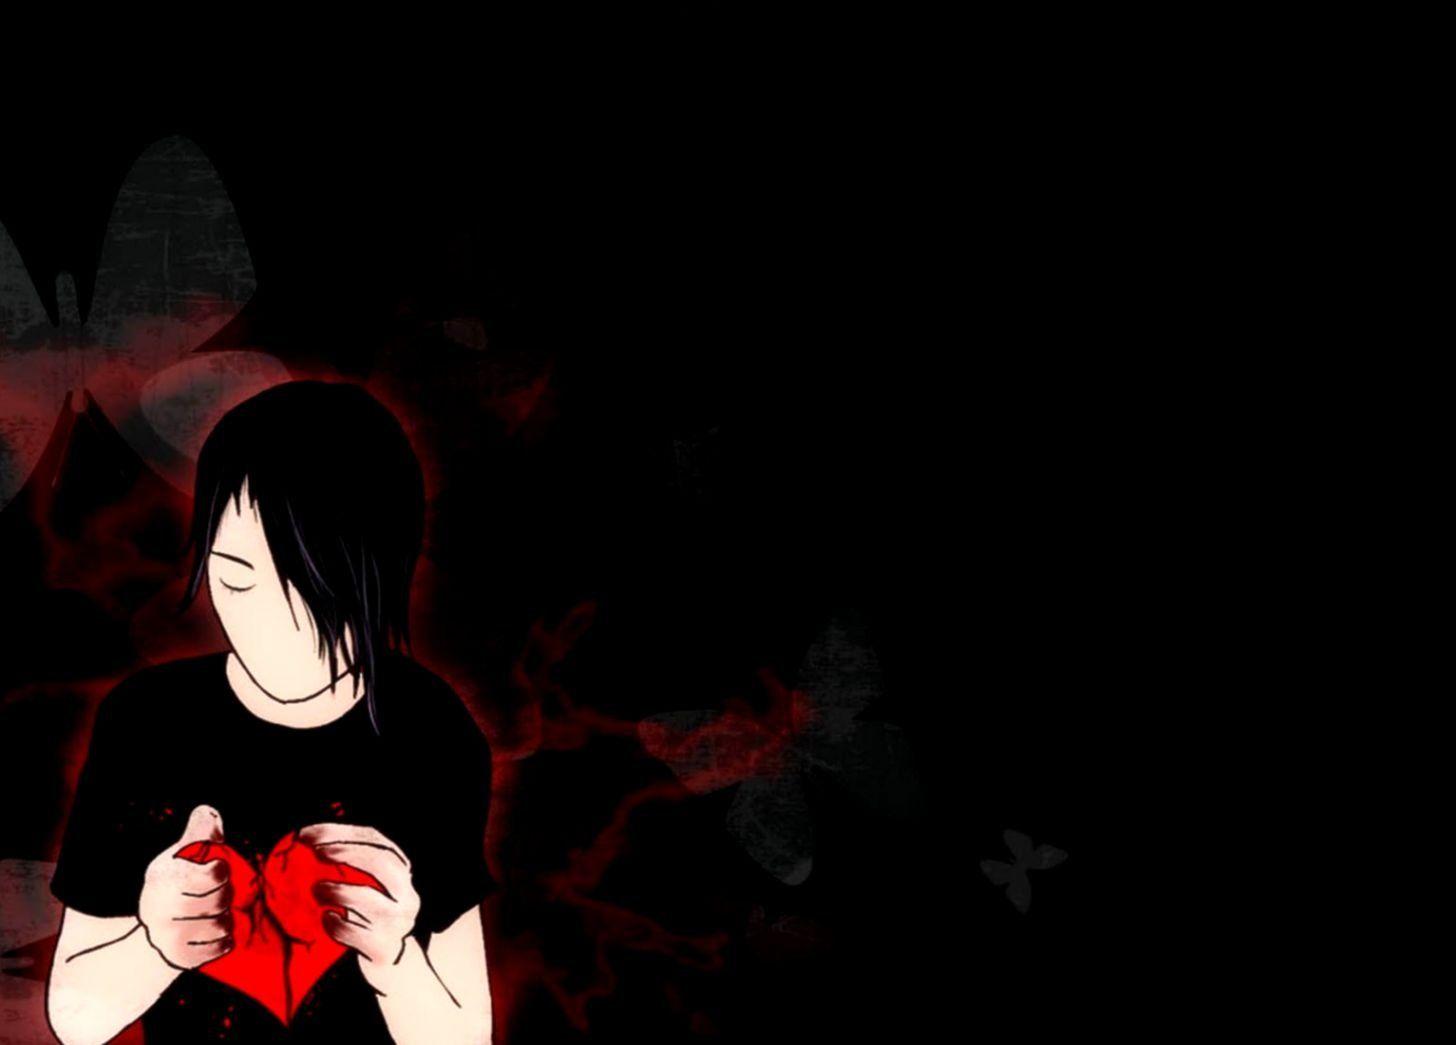 Depressed Broken Anime Girl Wallpapers Wallpaper Cave